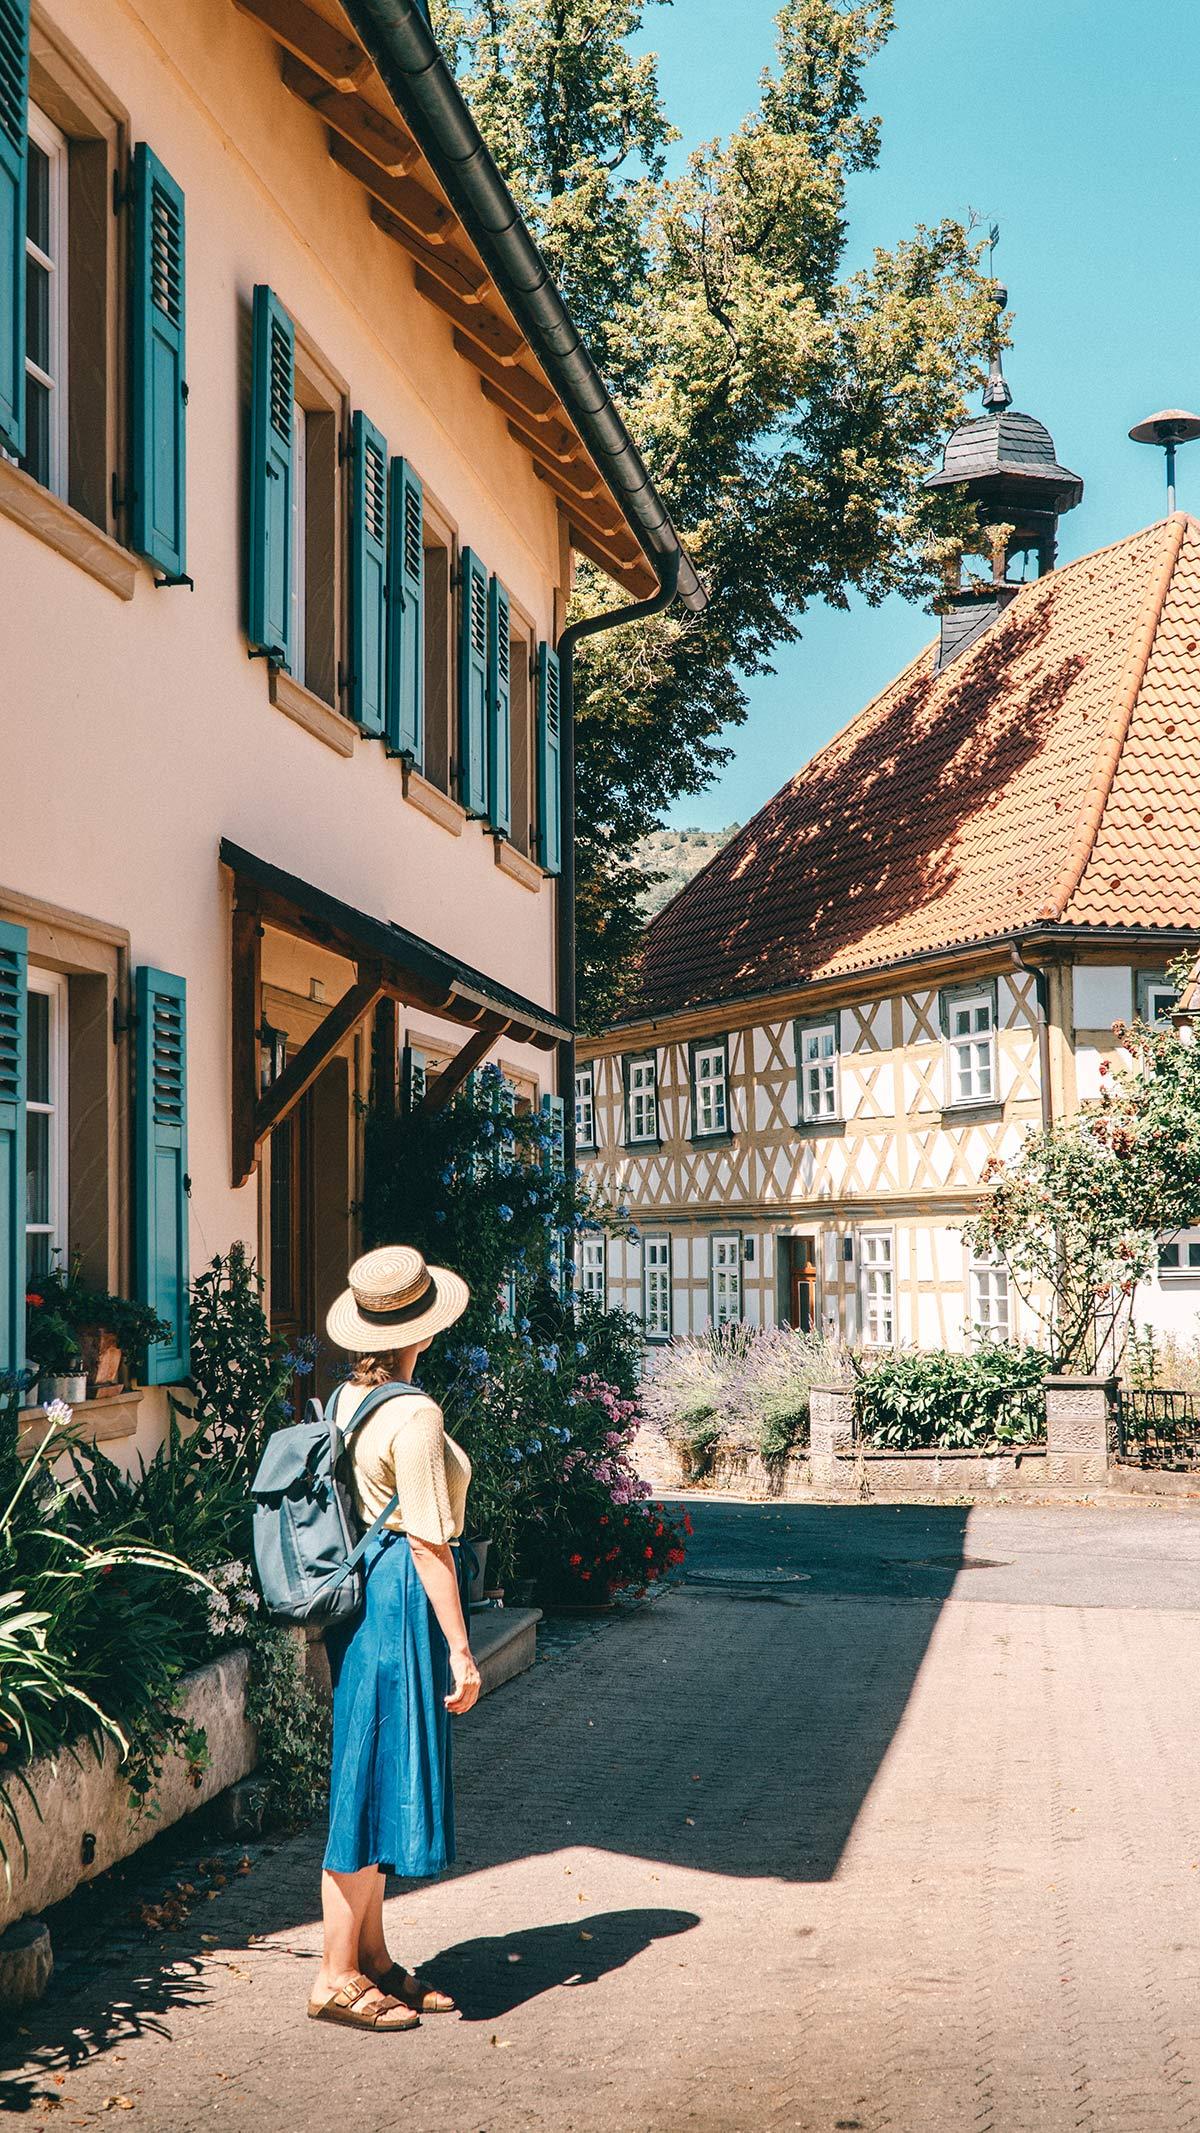 Genusswanderung Loffeld Blick Alte Schule